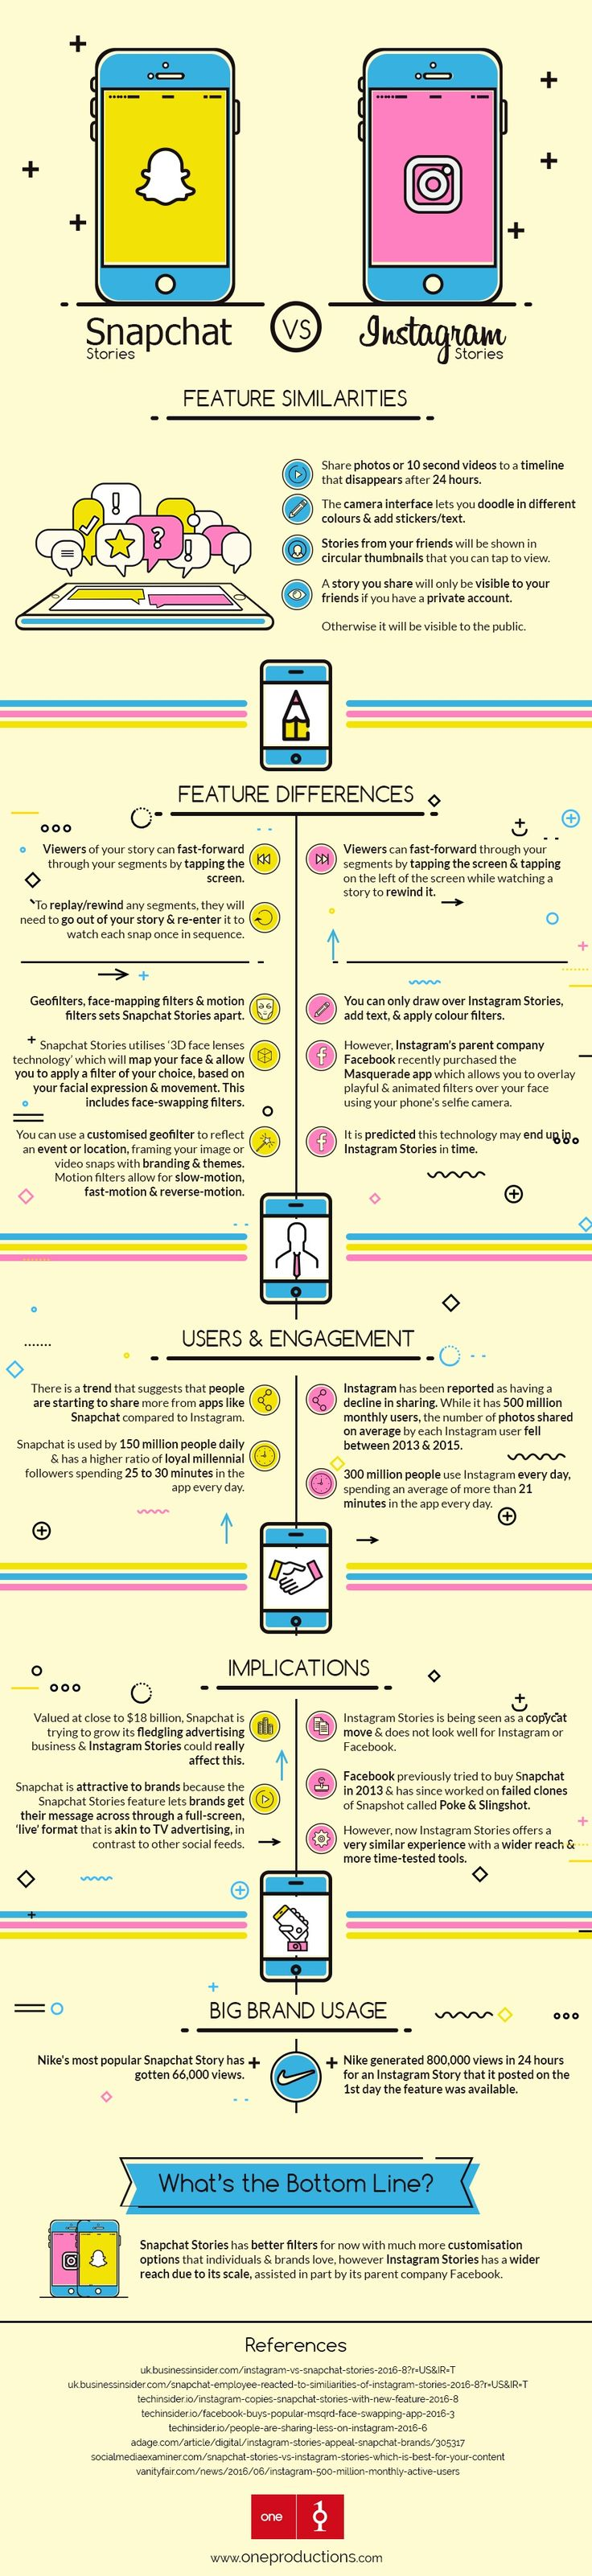 Snapchat Stories vs Instagram Stories [Infographic]   Social Media Today